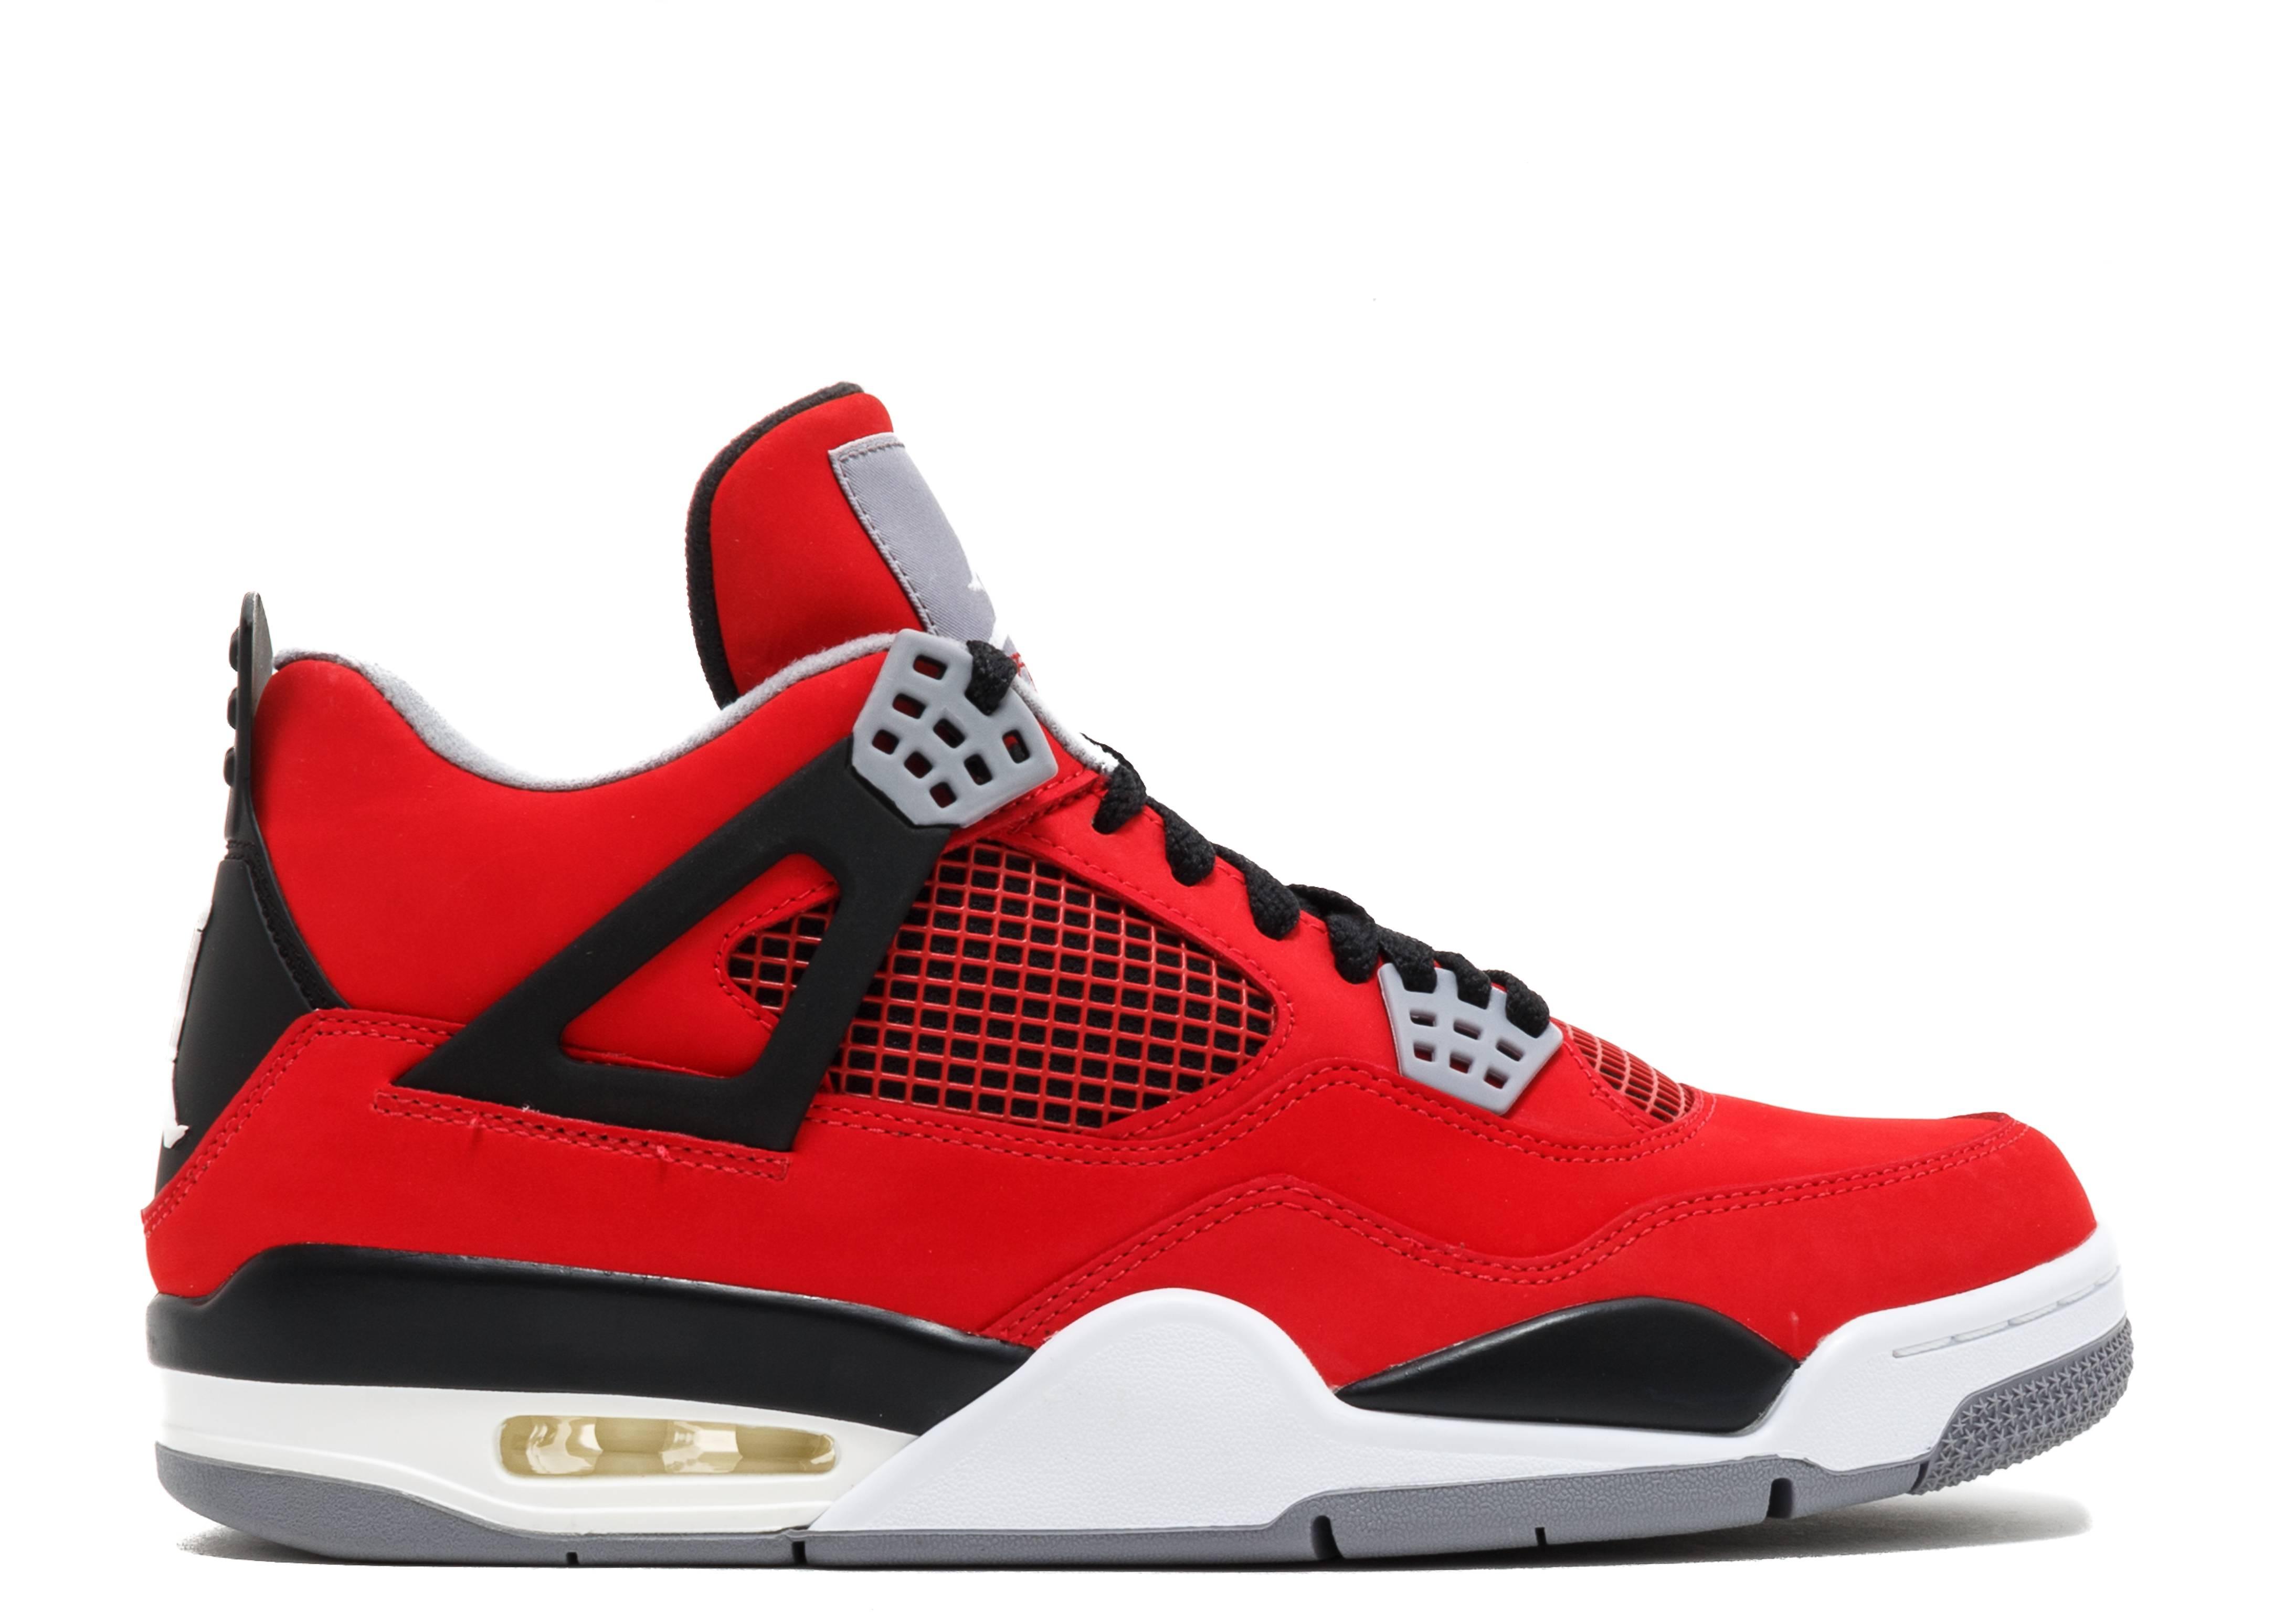 Nike Air Jordans 4 Retro